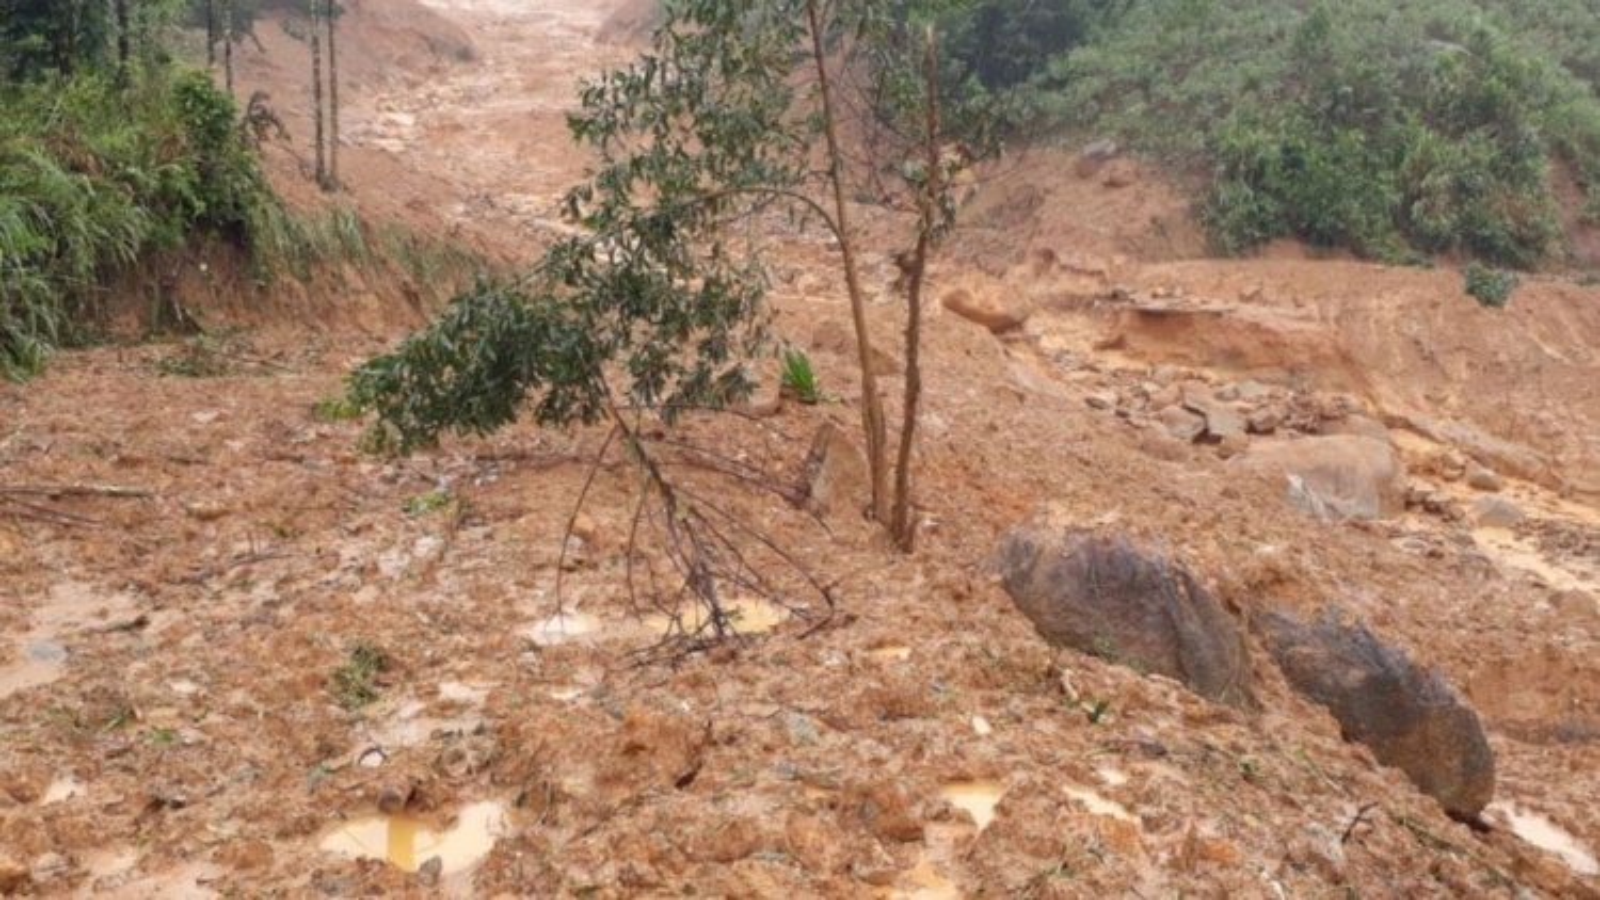 Floods and heavy rain ravage central region